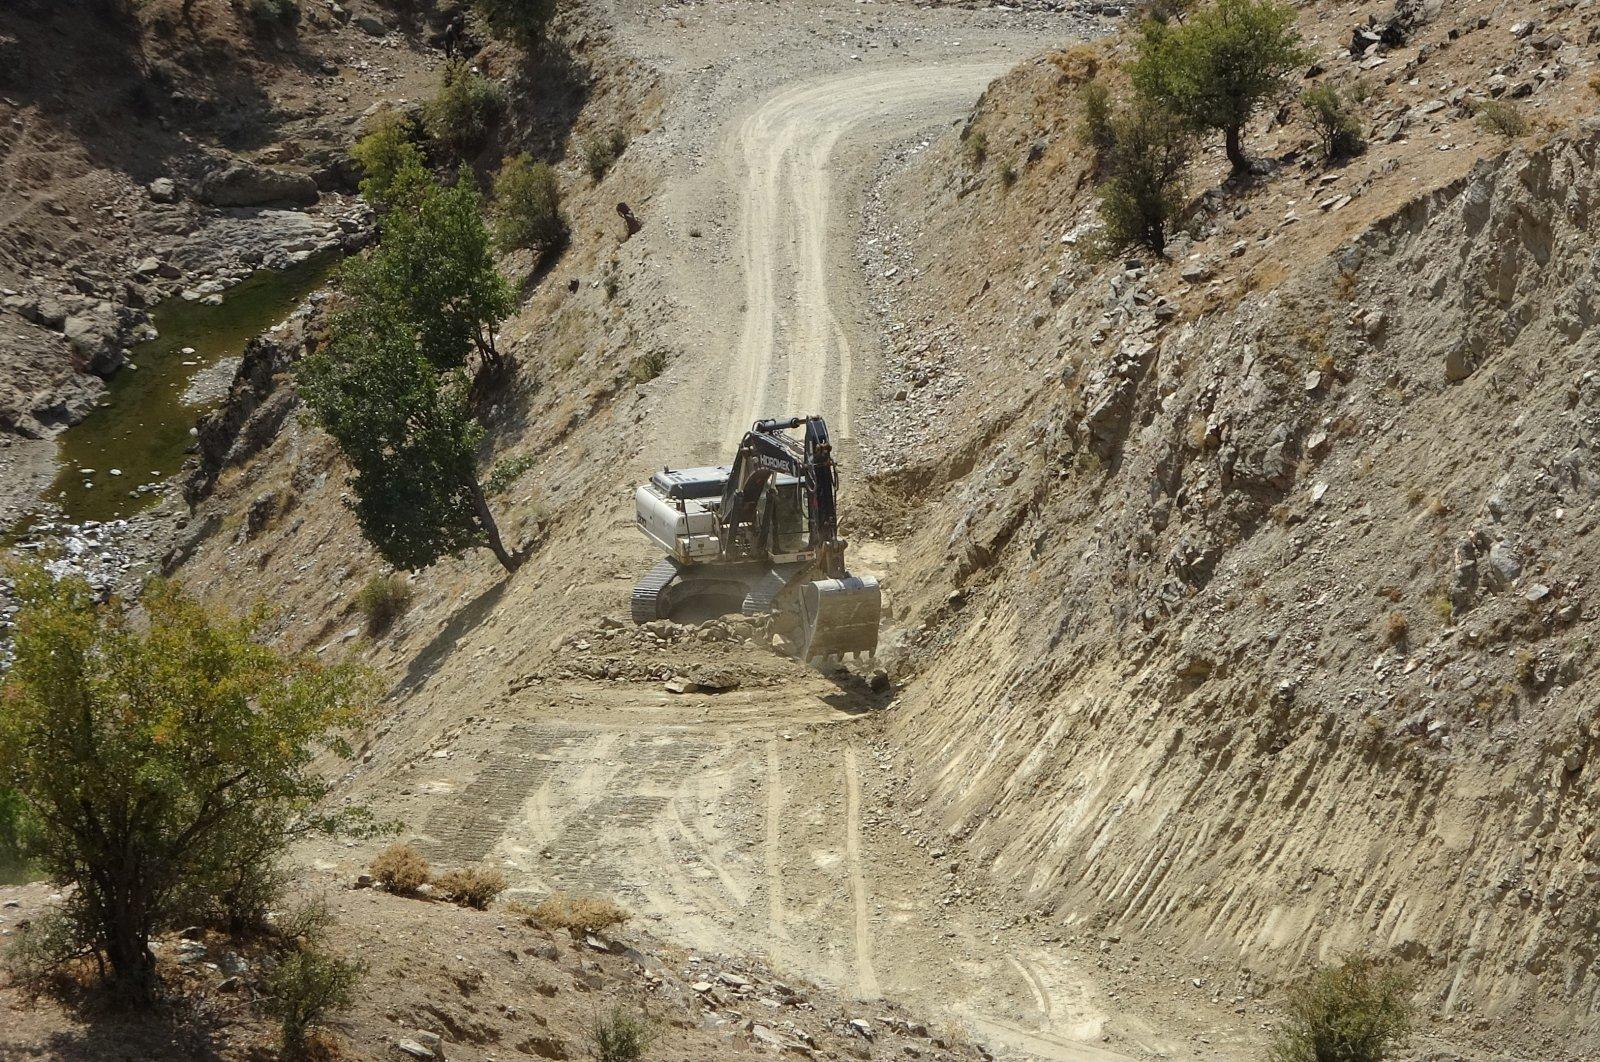 Roadwork near the Kayalısu village in Turkey's Muş province in this undated file photo. (IHA File Photo)